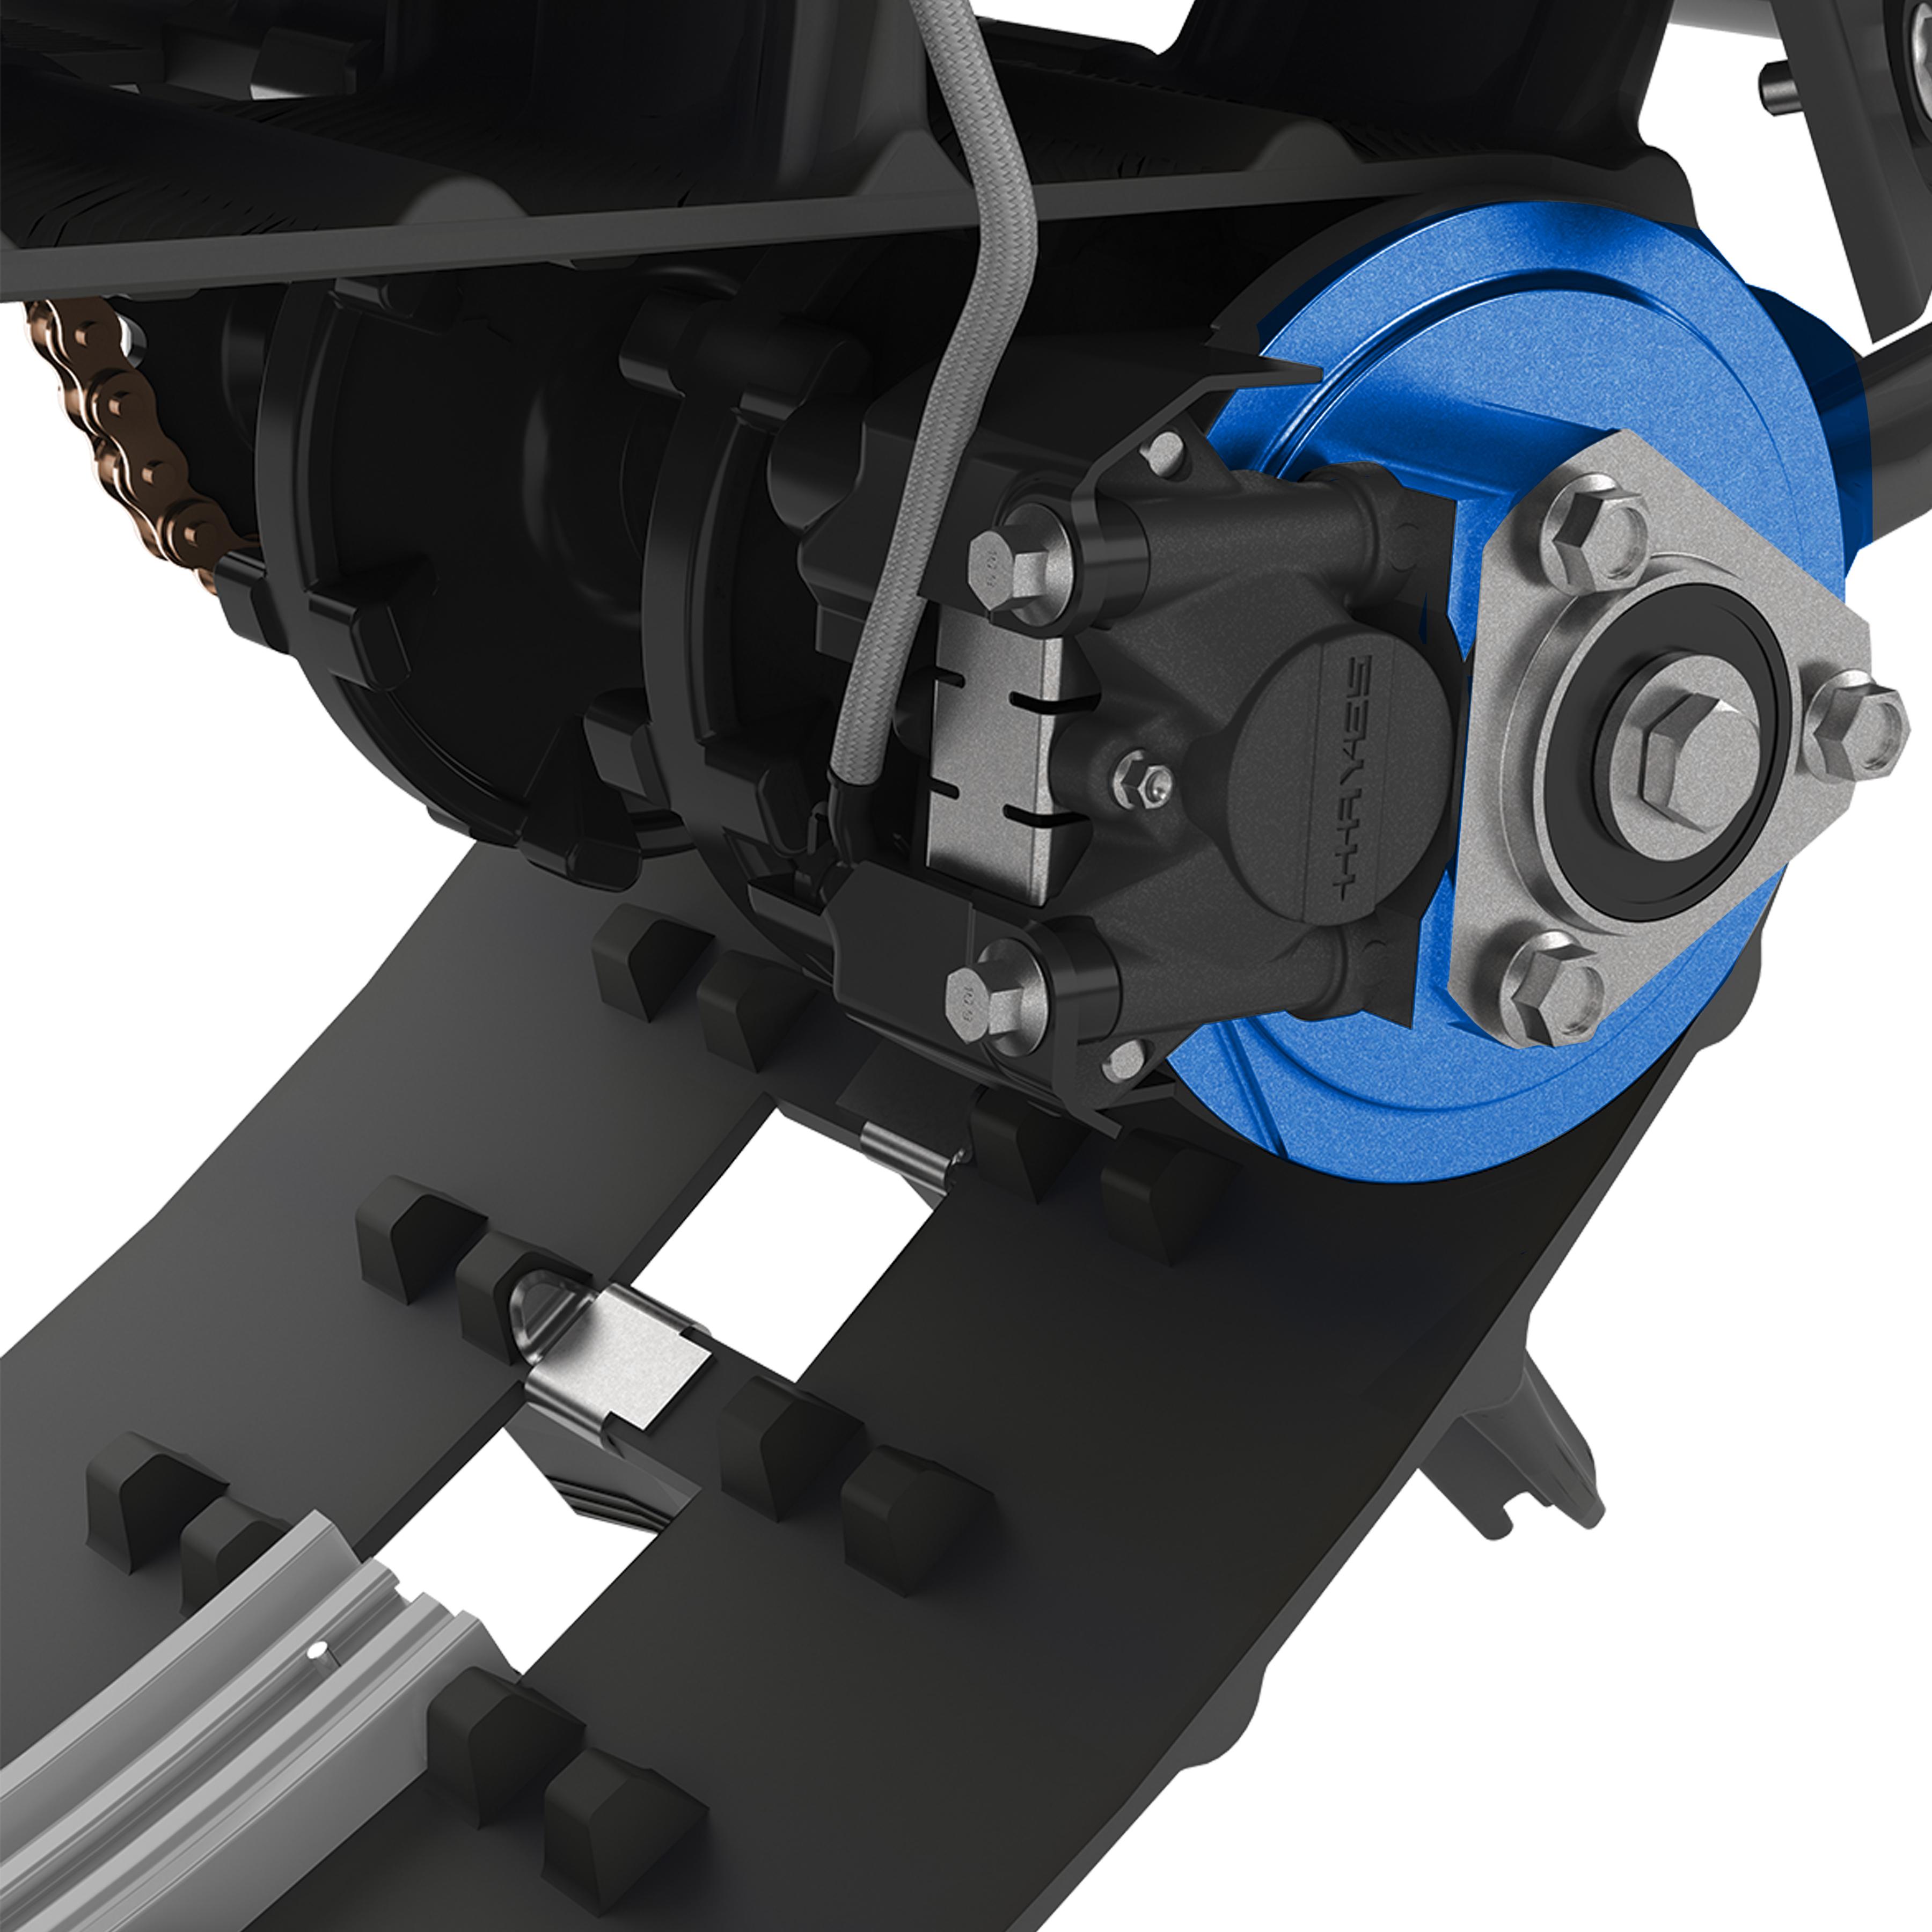 DTS 129 2019 brake system Feat Blue v3b 1